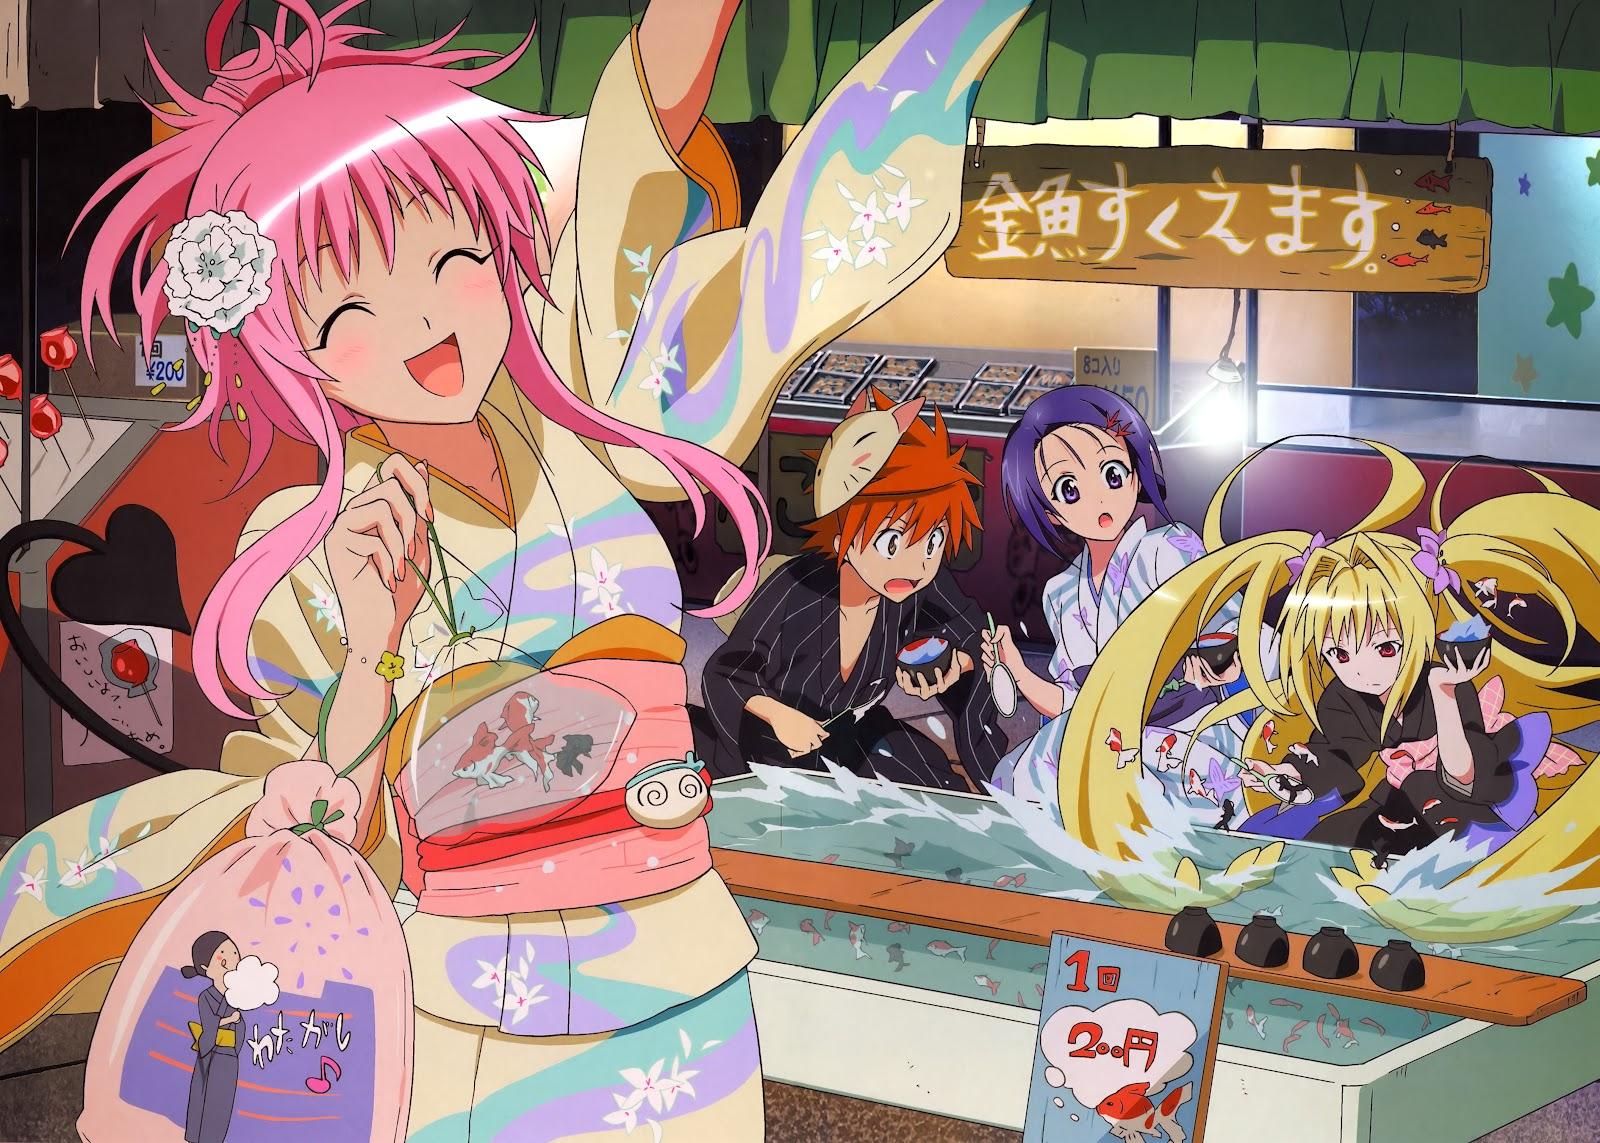 http://4.bp.blogspot.com/--Yle_0wvxwg/UFZ2_DirqHI/AAAAAAAAMMQ/hI1jkJM0s-Y/s1600/To+Love+Ru+Darkness+New+Anime+Show+Review+Lala+Yami+Rito+and+Haruno+5+stars+phistars+wallpaper.jpg